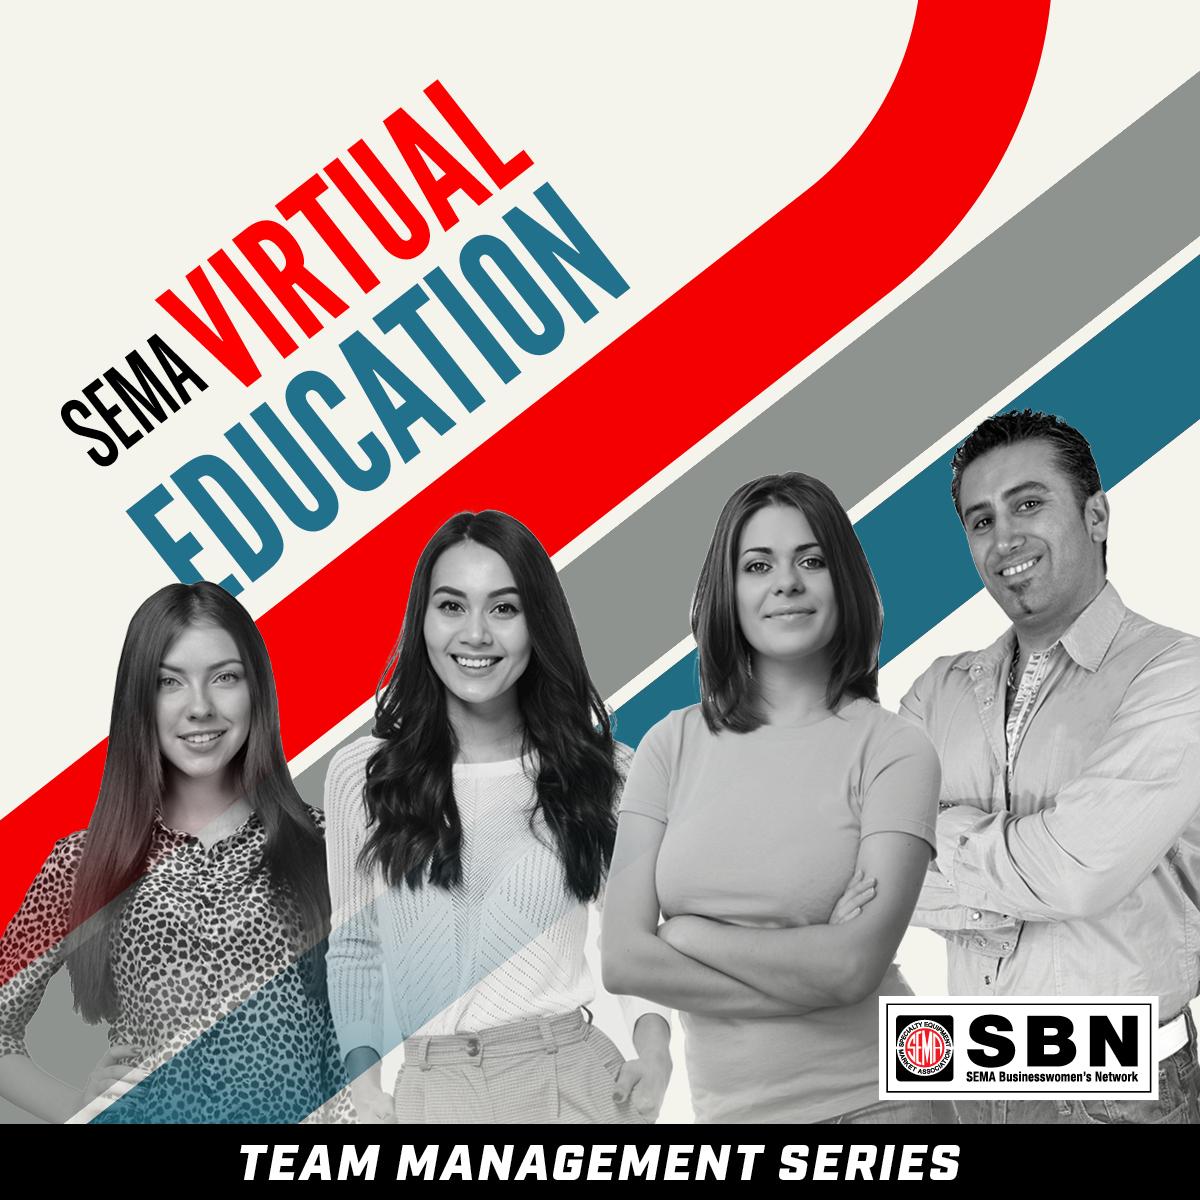 SEMA Virtual Education - The Value of a Diverse Team